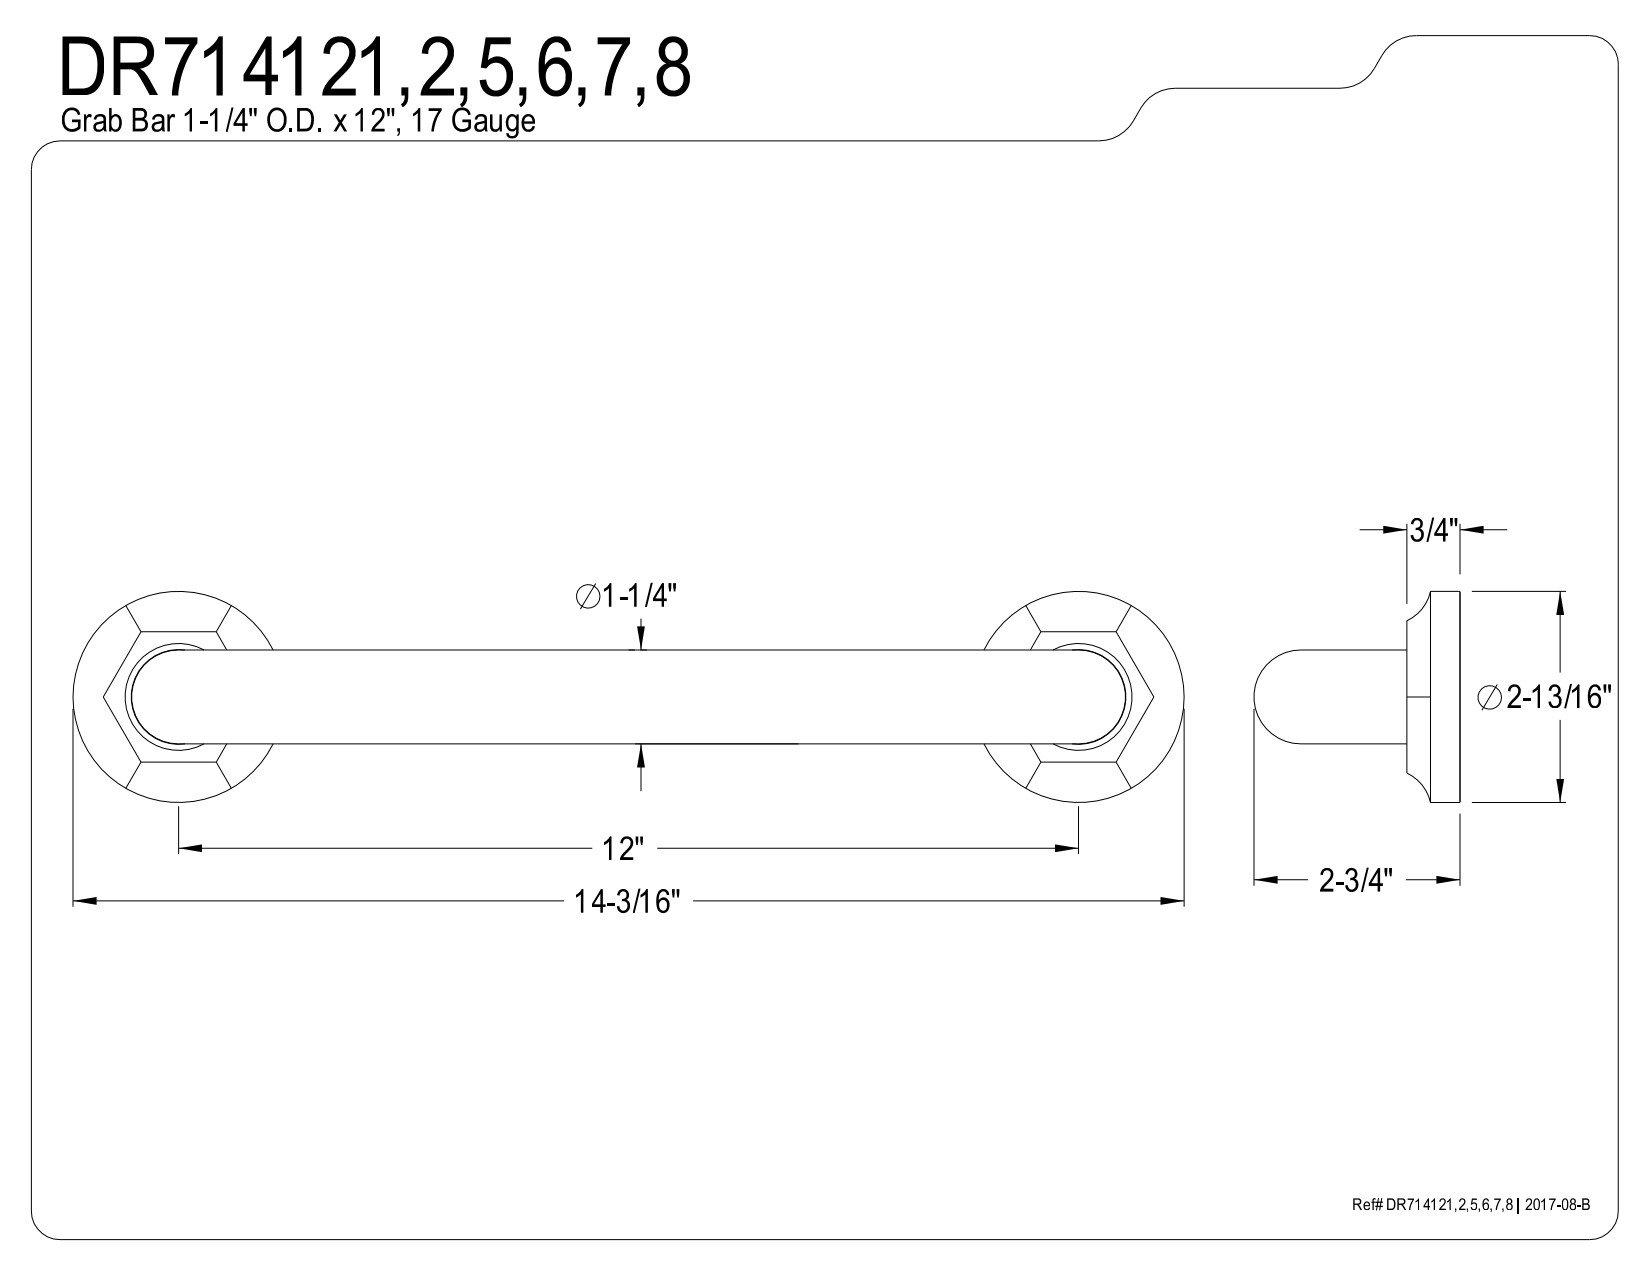 Kingston Brass DR714125 Designer Trimscape Metropolitan Decor 12-Inch Grab Bar with 1.25-Inch Outer Diameter, Oil Rubbed Bronze